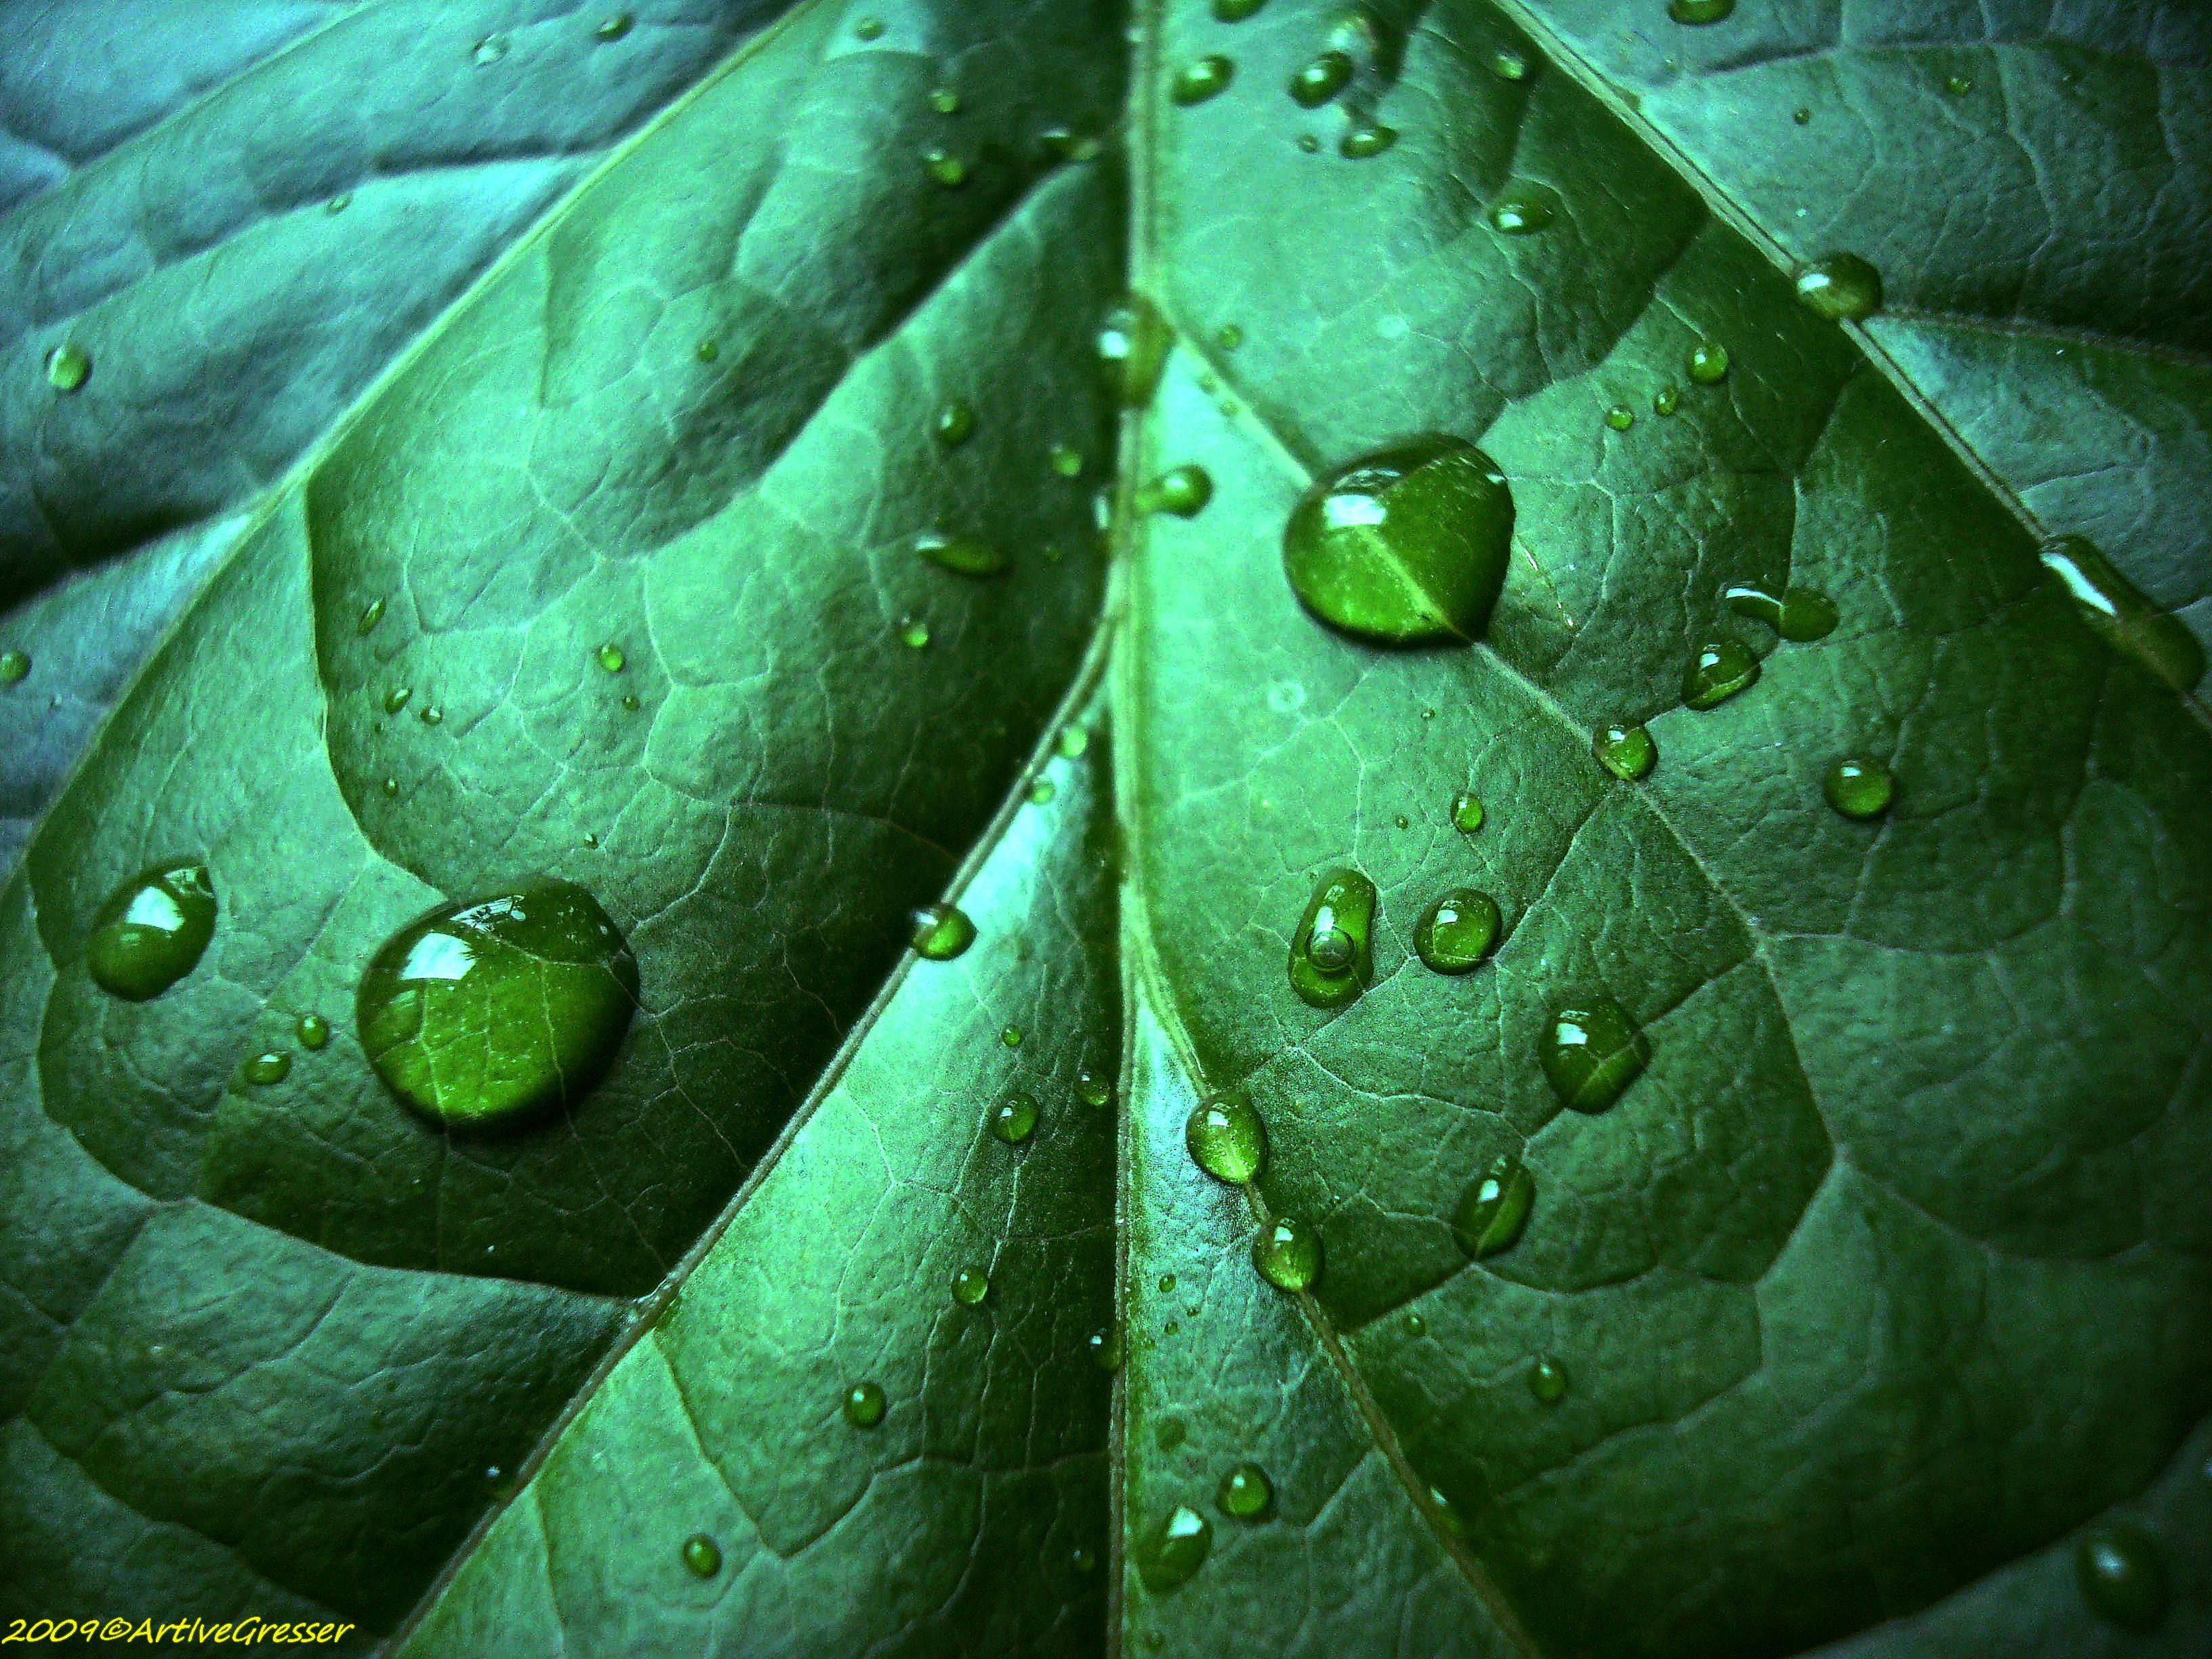 33Blatt_dunkelgrün